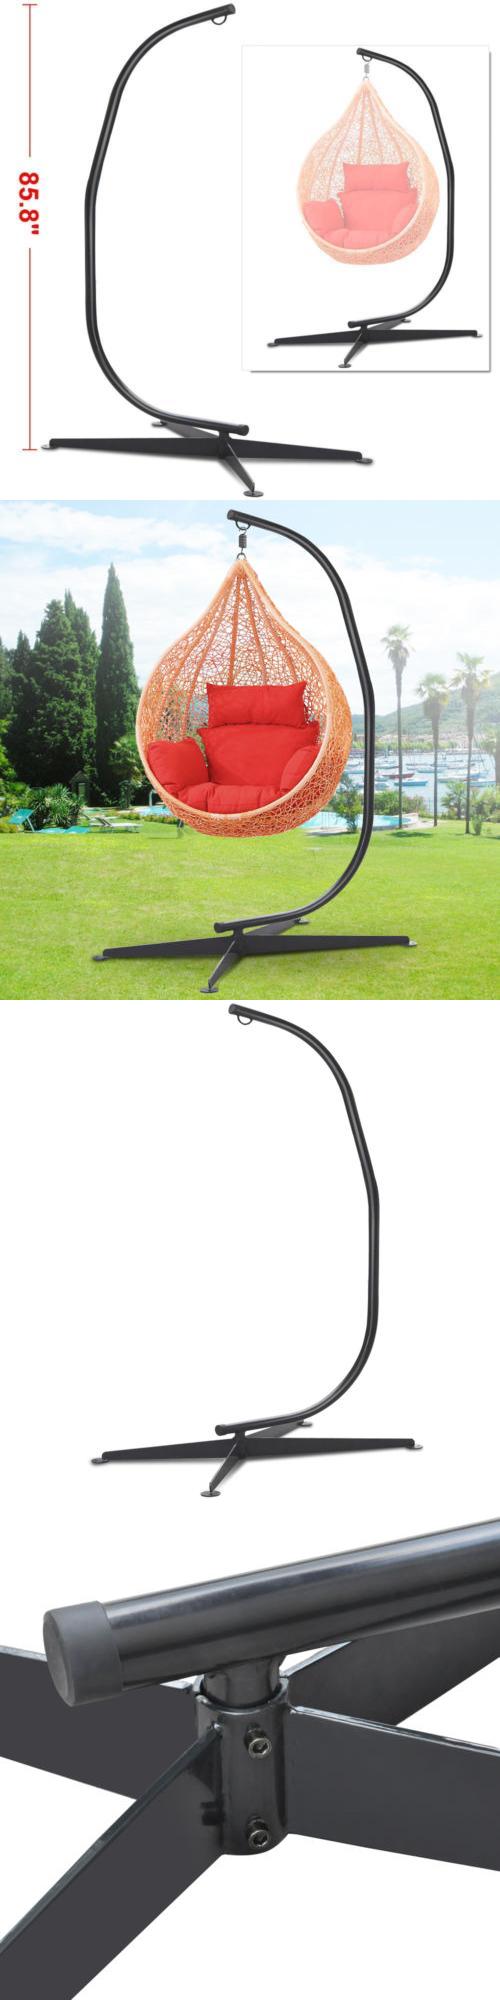 Hammocks black solid steel c frame chair hammock stand